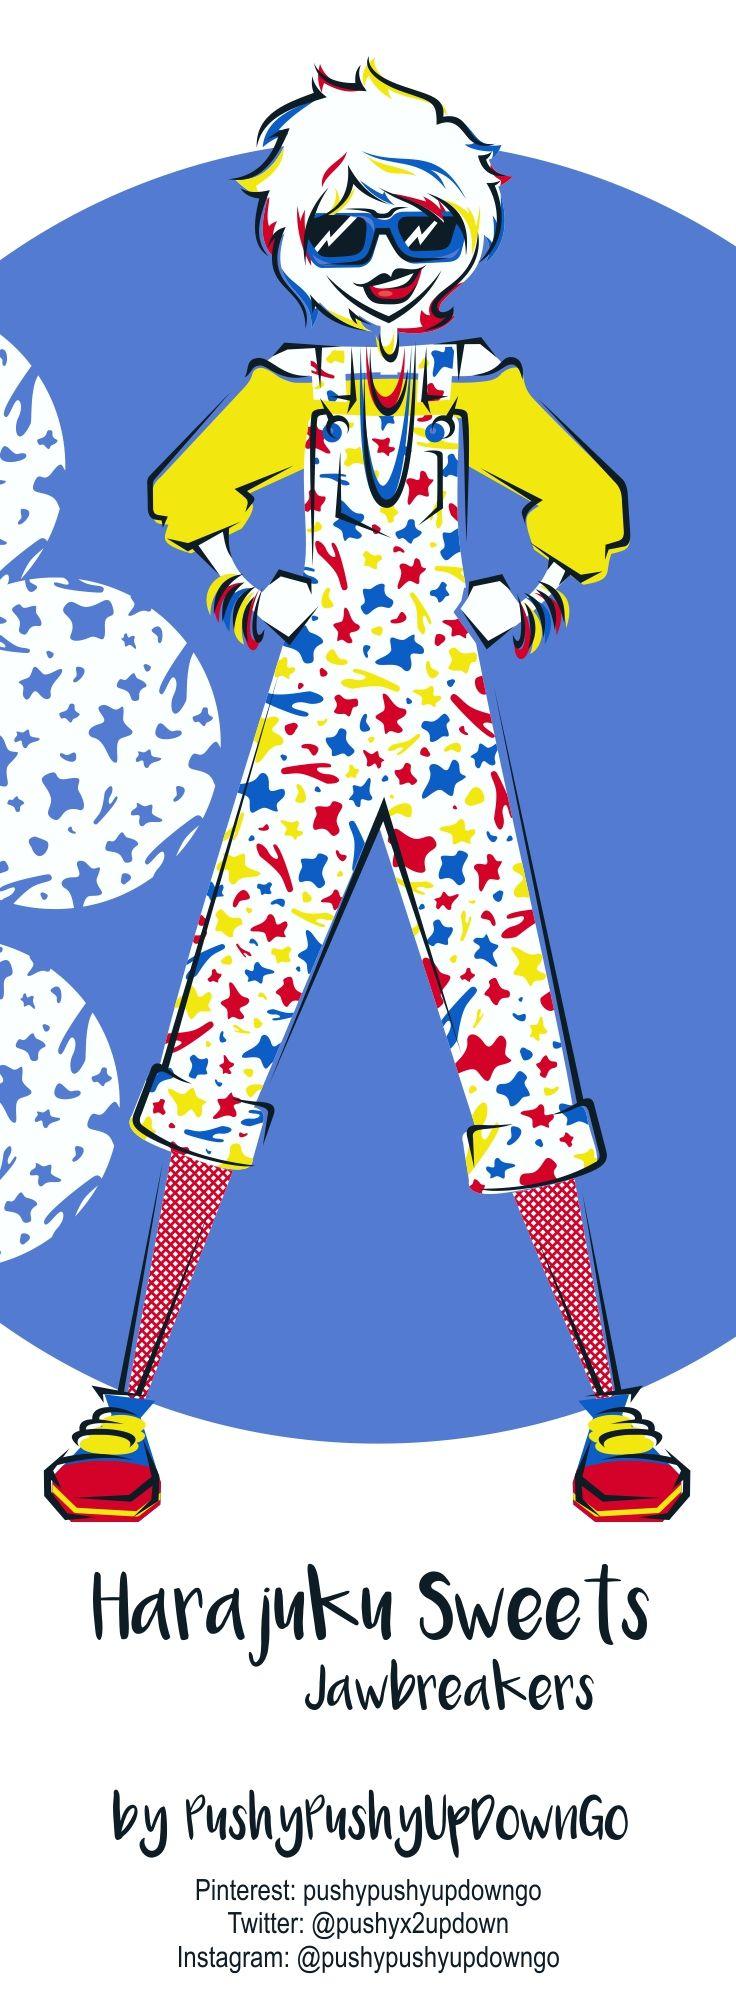 From my Harajuku Sweets kawaii fashion illustration series (available as part of a 10-piece postcard art print set)